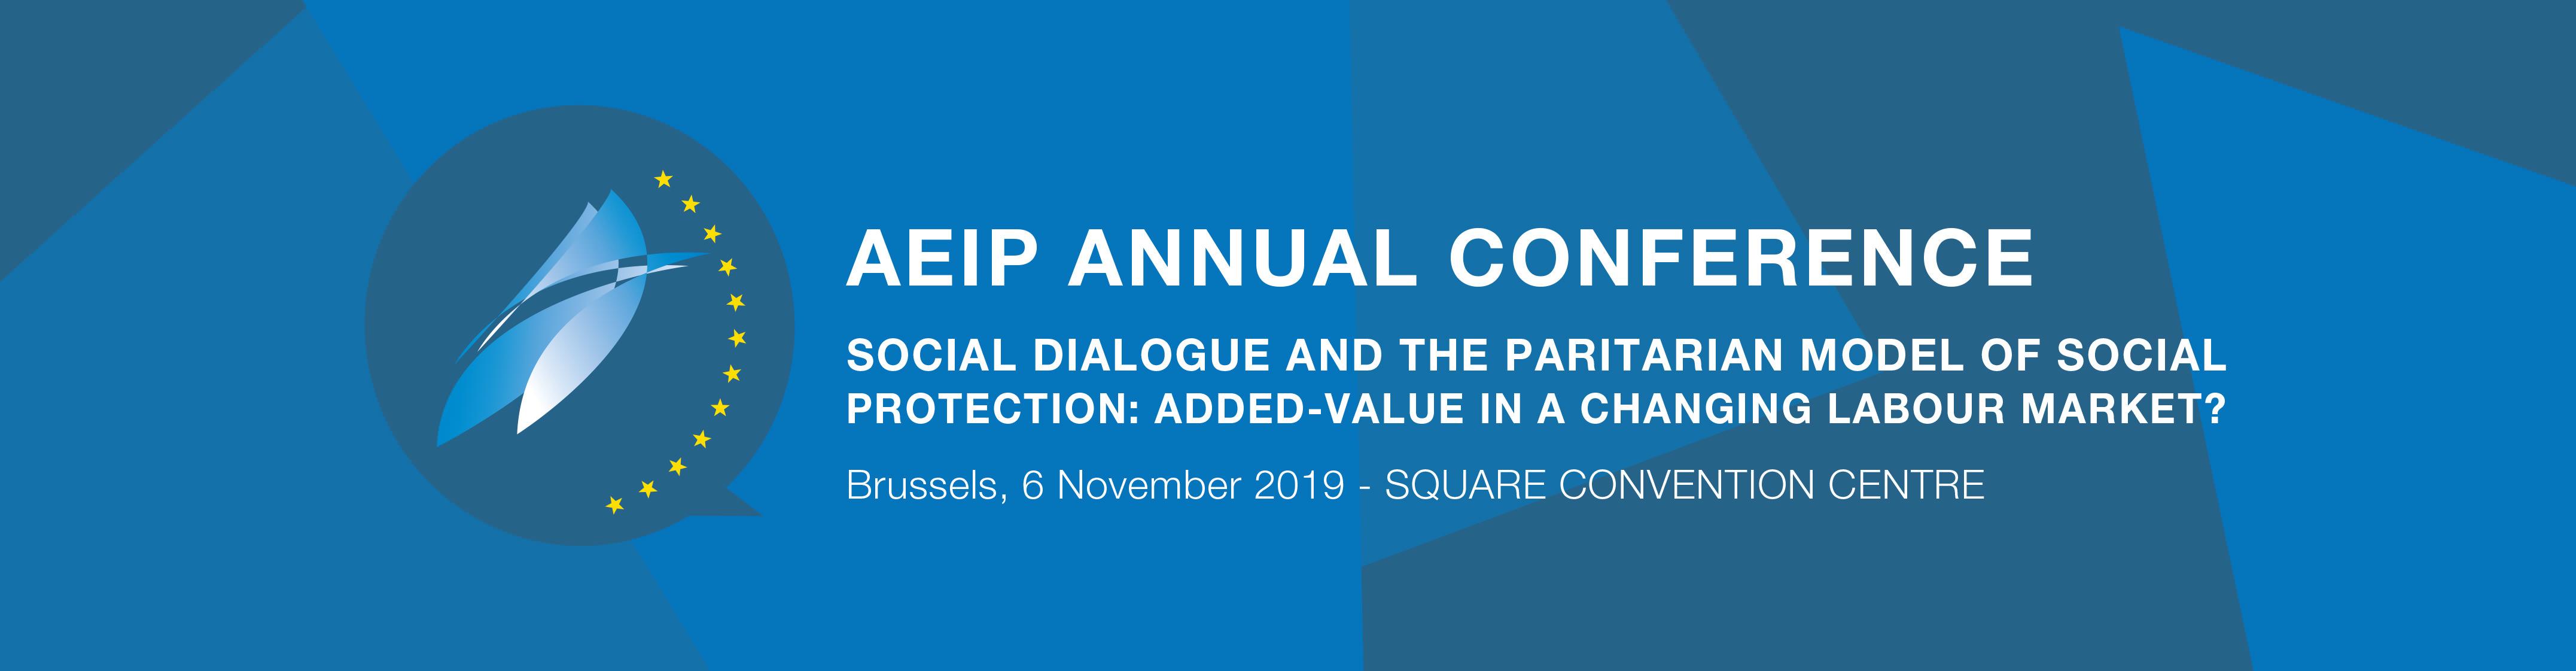 AEIP – ANNUAL CONFERENCE 2019 – AEIP